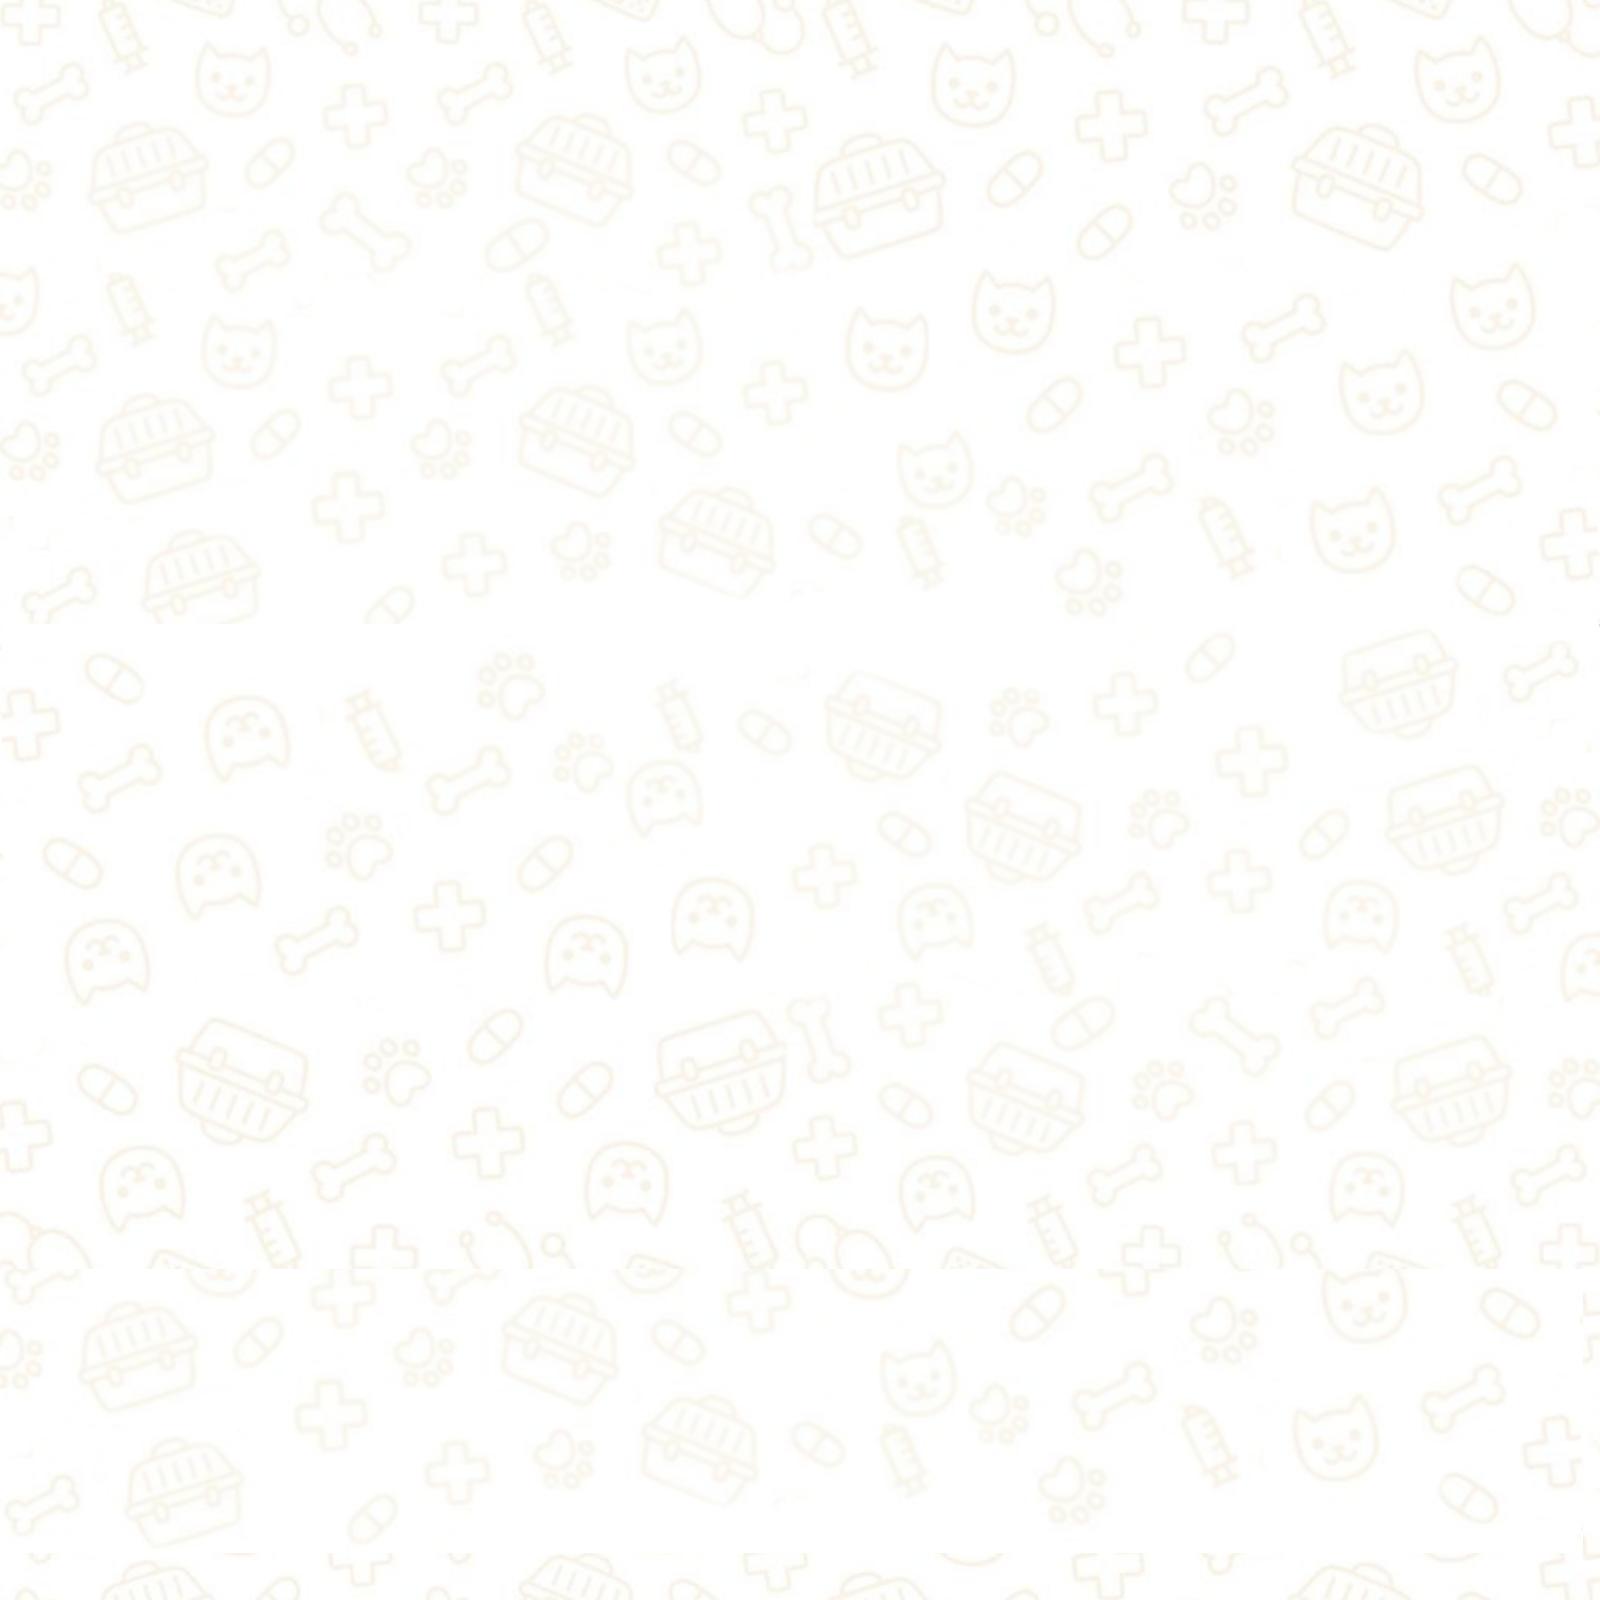 pet-background-1600x1600-1-1